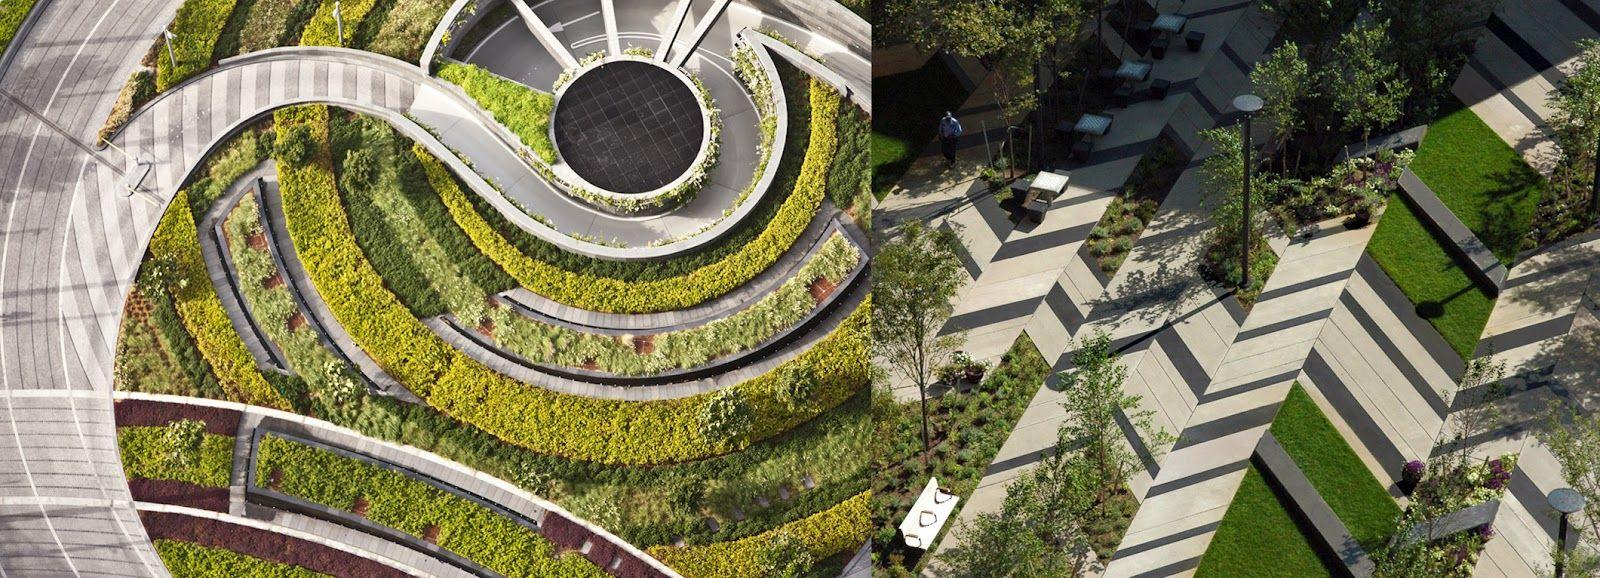 Burj khalifa park by swa group ud landscape design for Swa landscape architecture